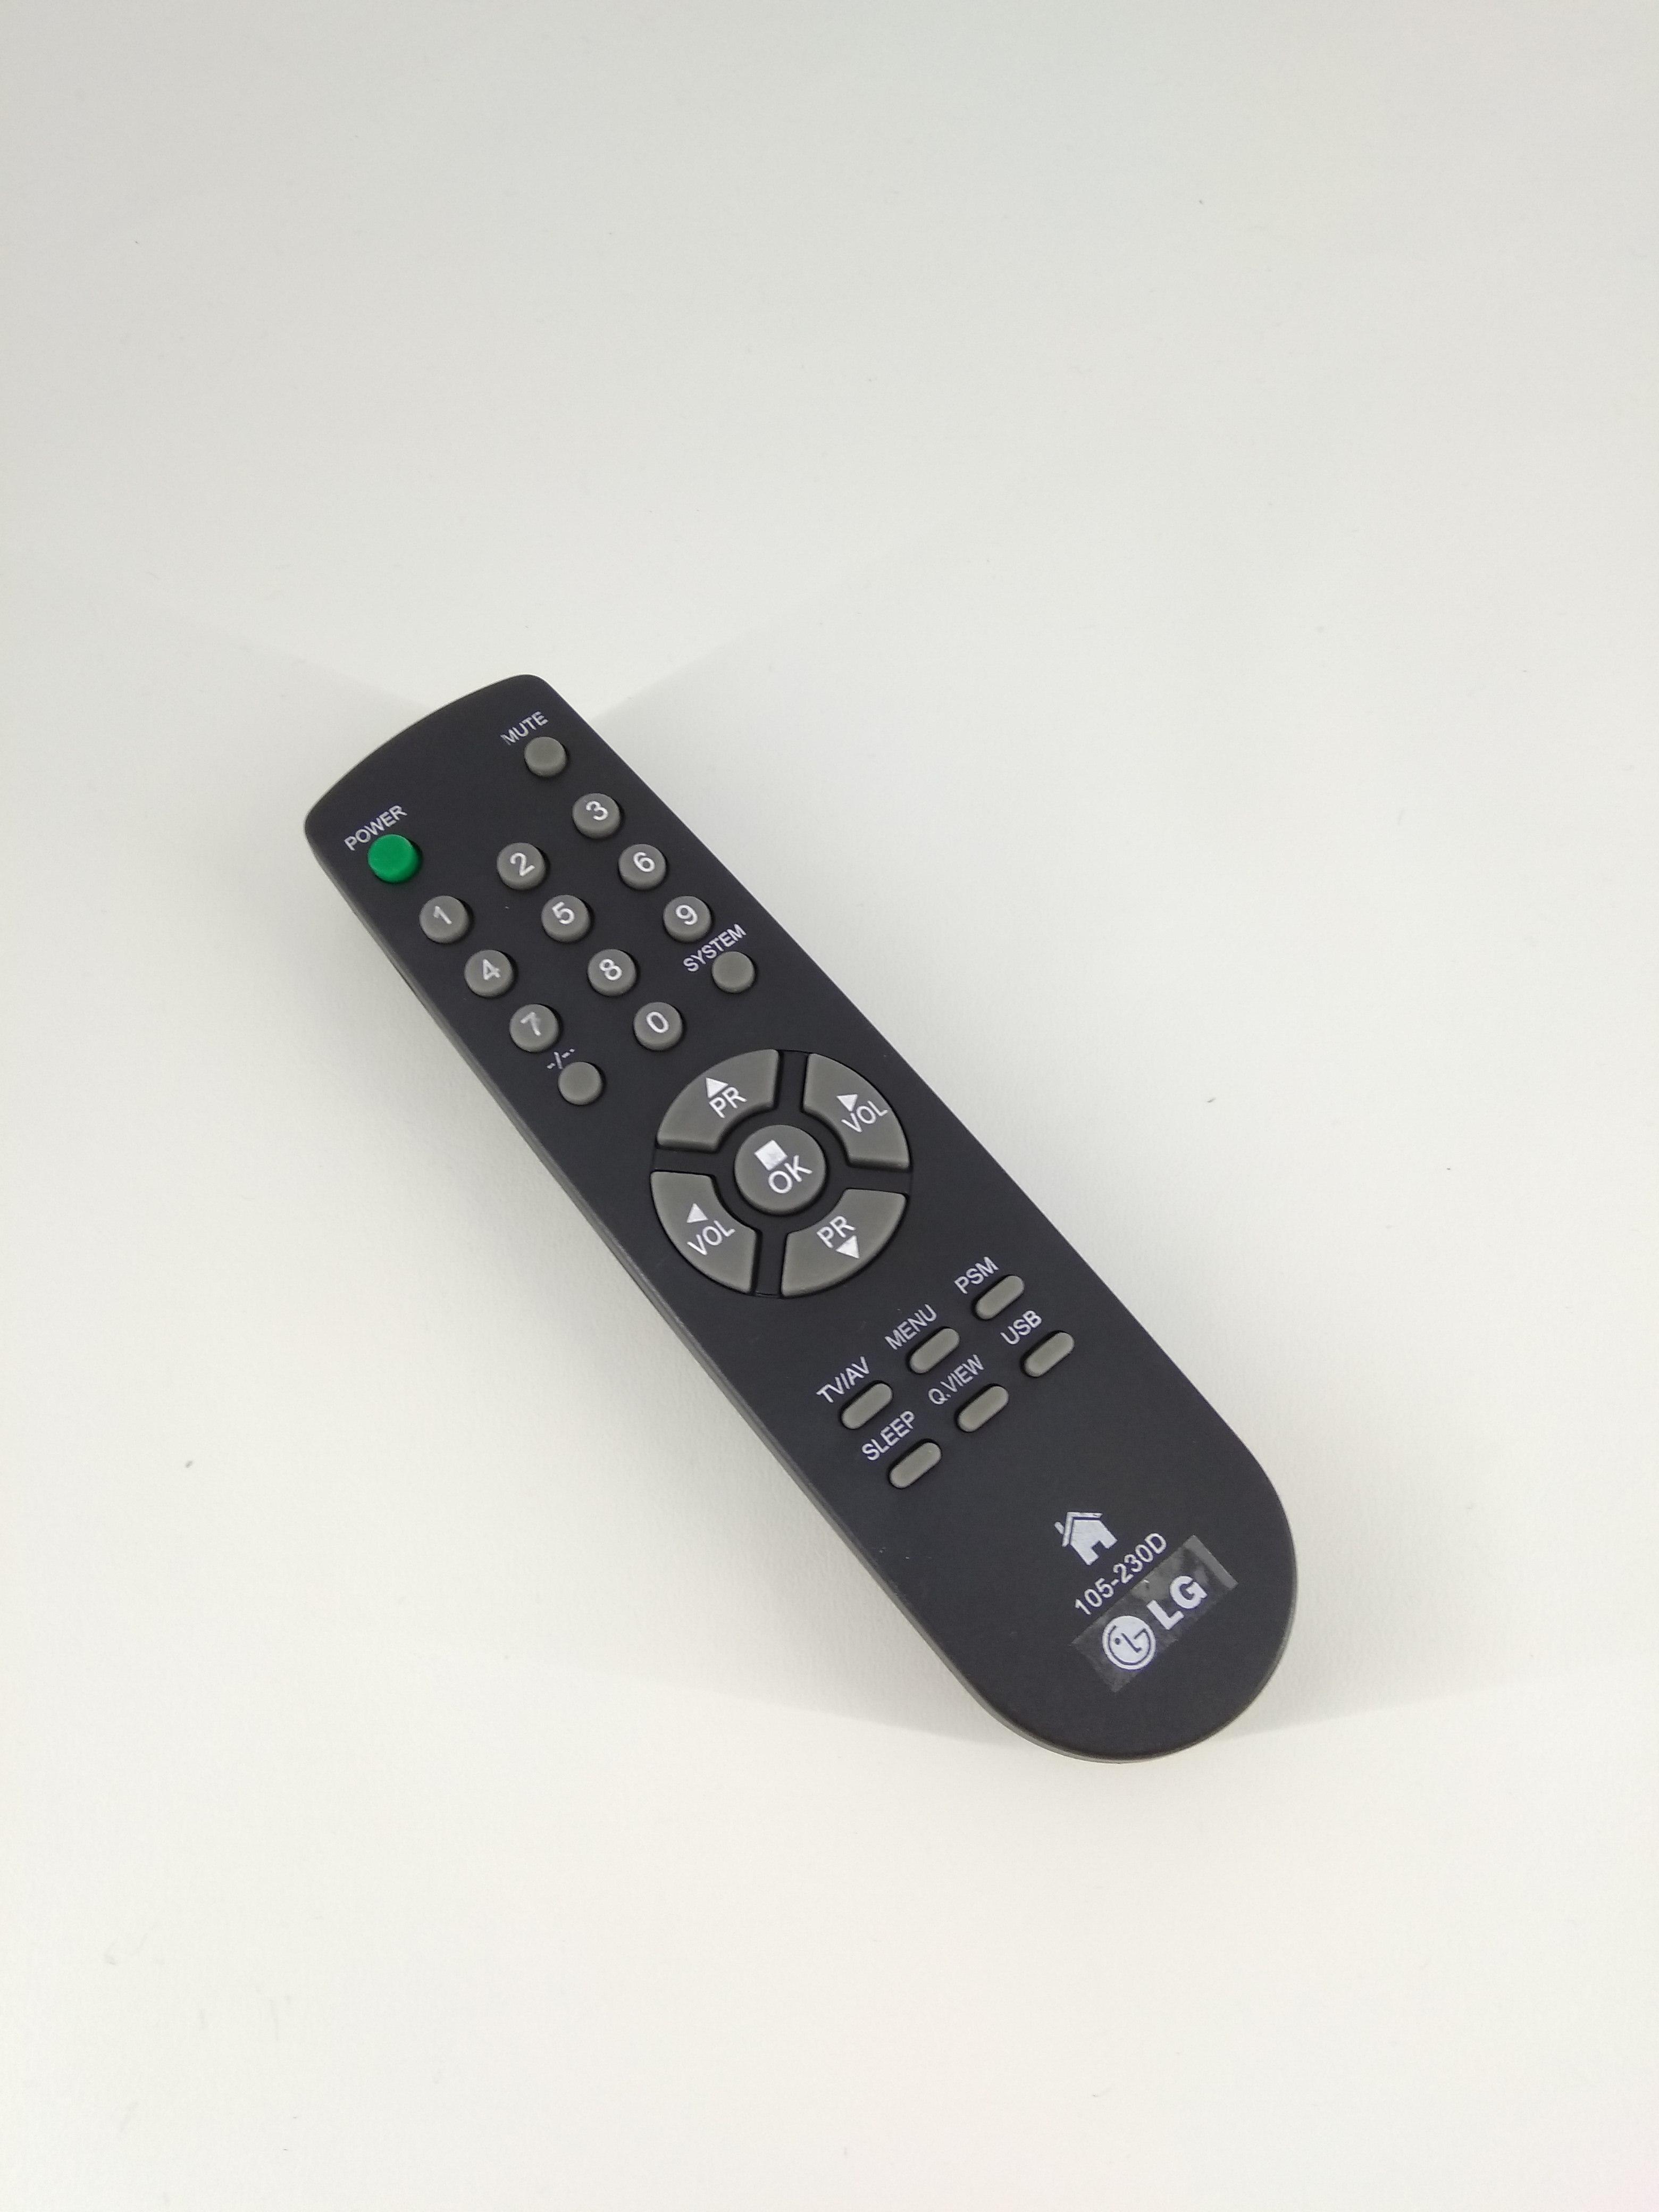 Remot Remote TV LG Tabung 105-230D Original Pabrik / KW